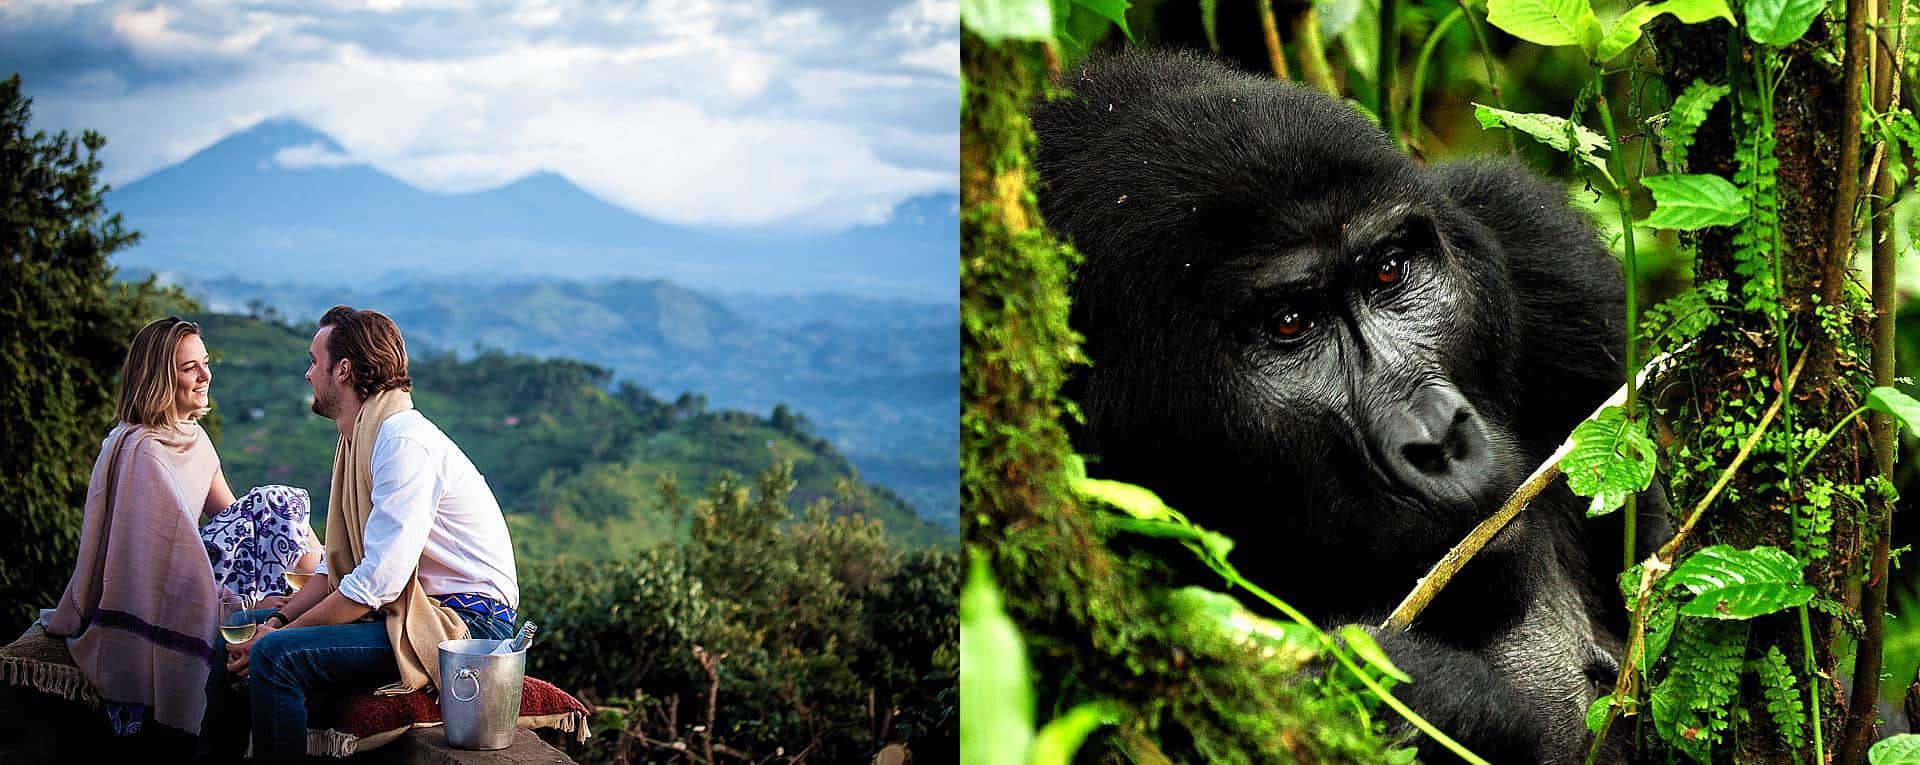 Uganda Trip Ideas & Booking Itineraries